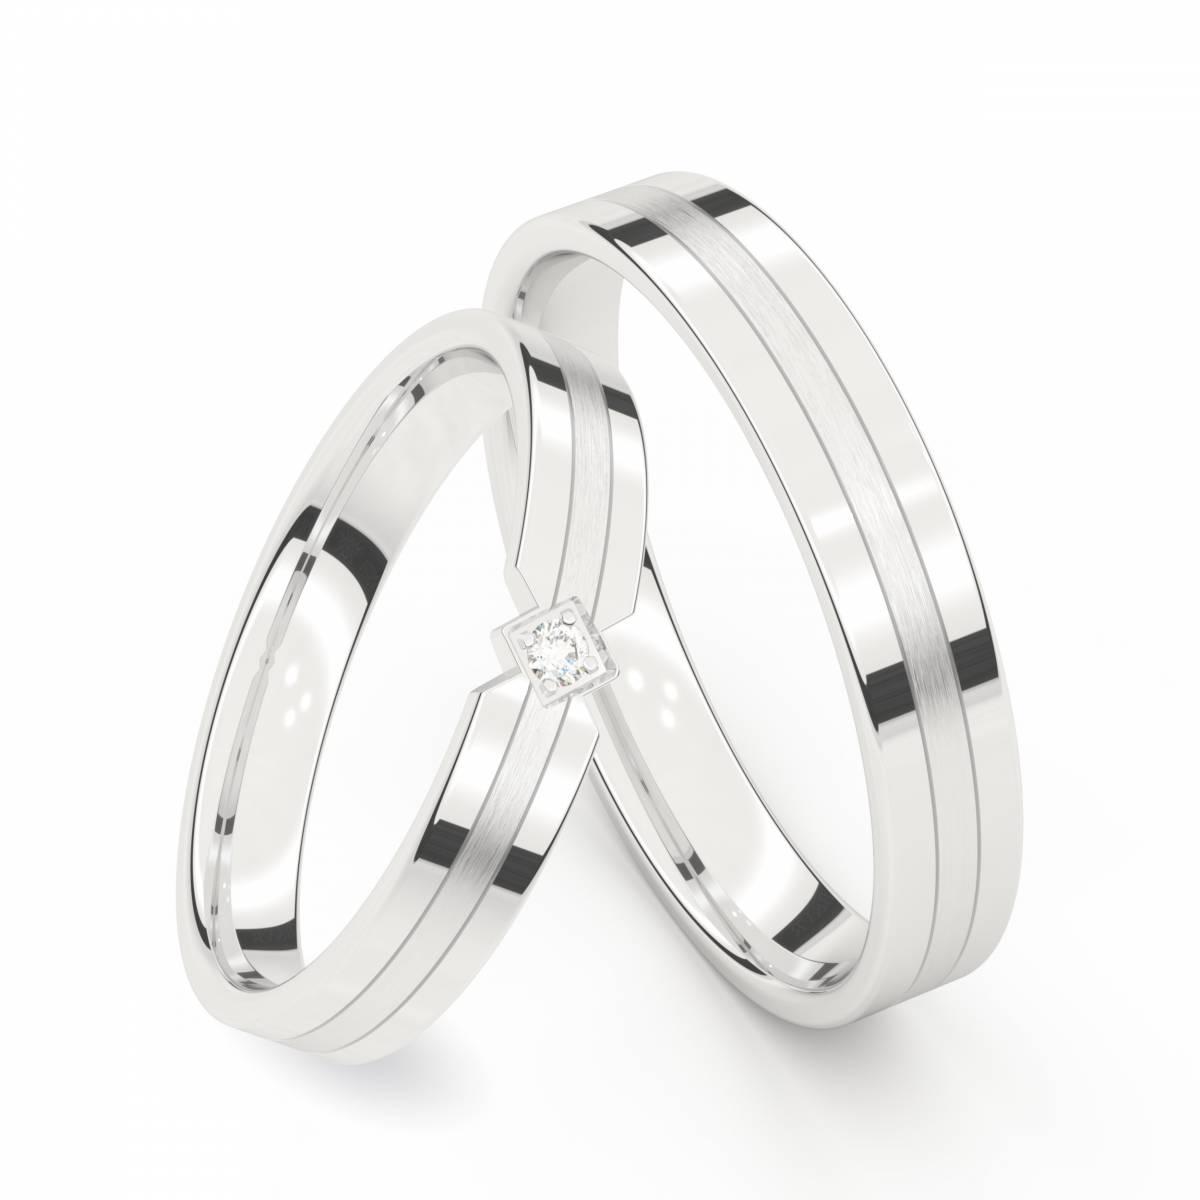 Juwelier Jan Maes - Trouwringen - Verlovingsringen - Juwelen - House of Weddings - 17